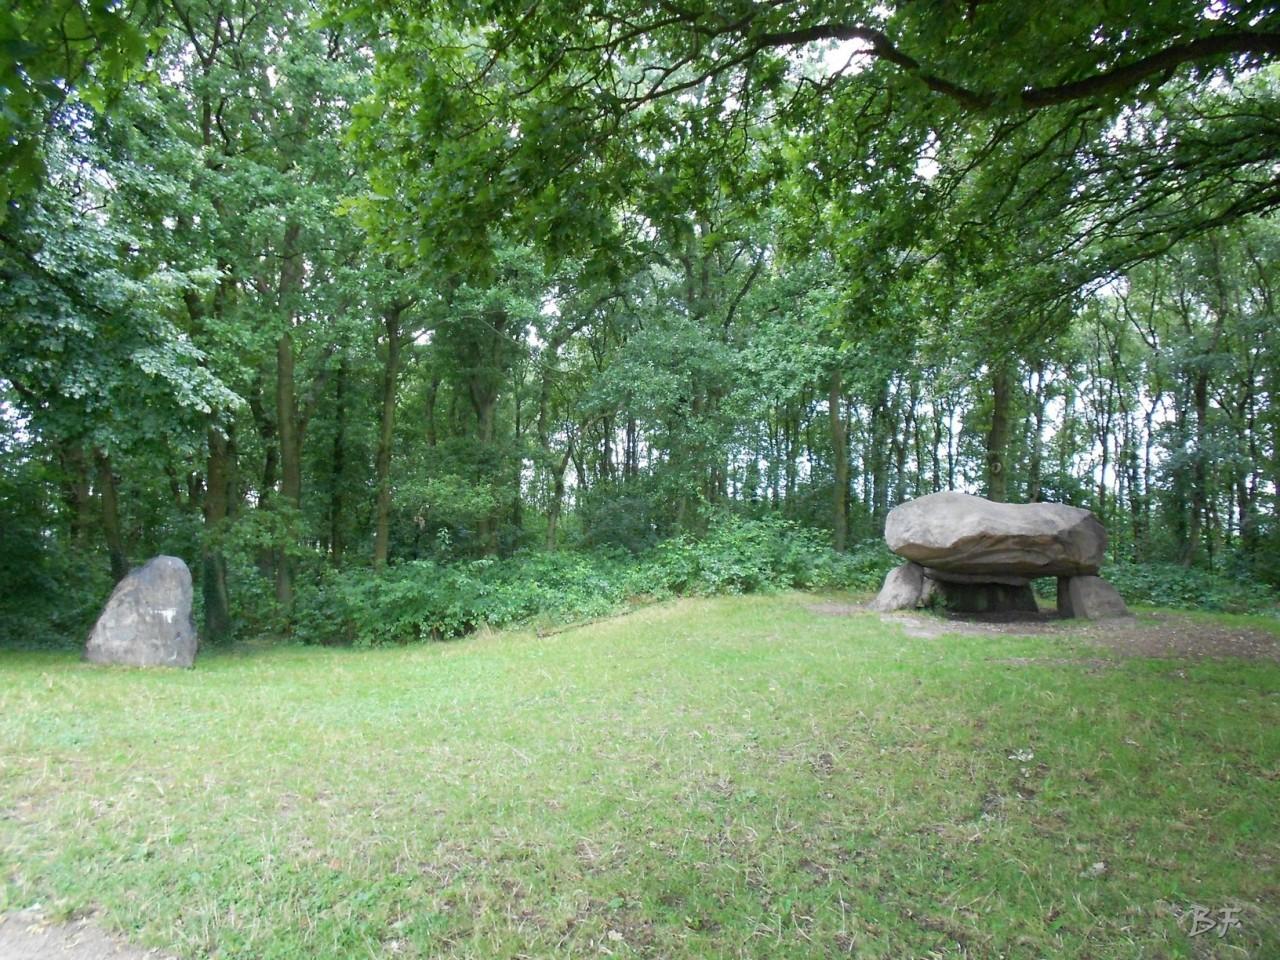 Hunebedden-Dolmen-Megaliti-Groeningen-Drenthe-Paesi-Bassi-16